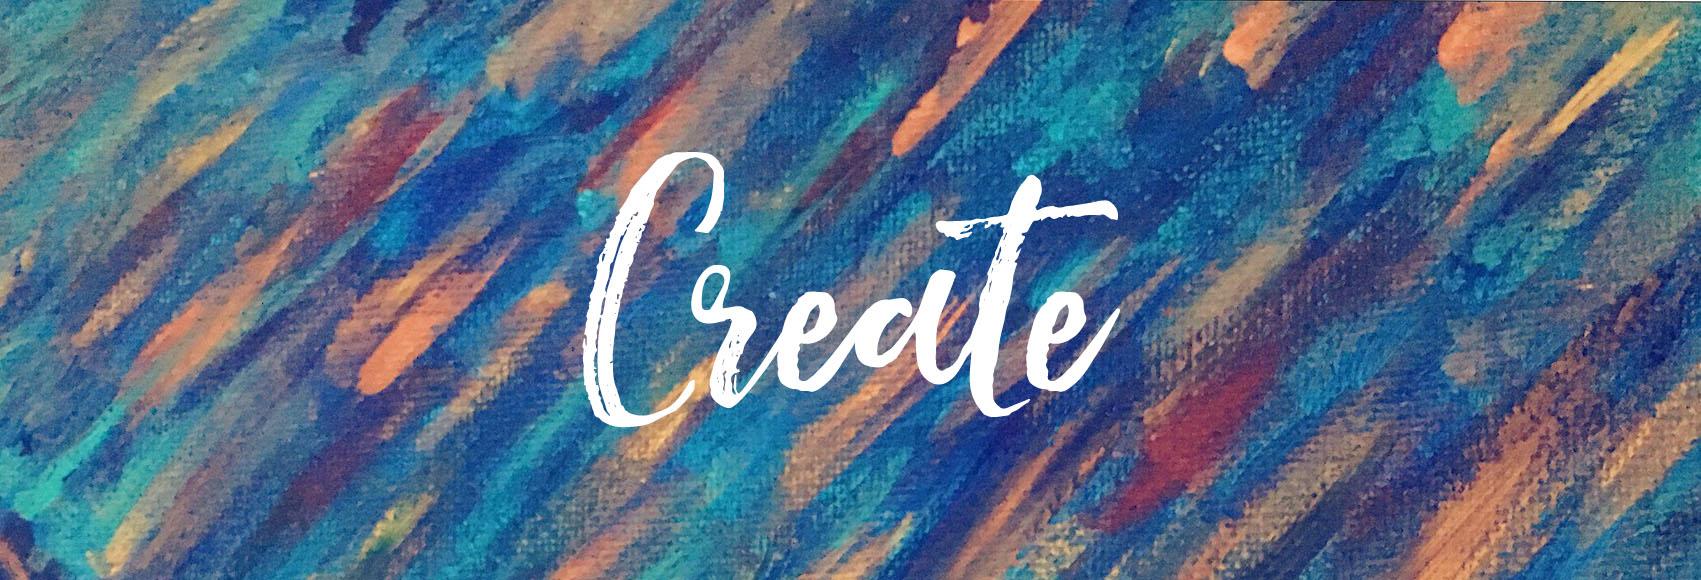 Create Program Image.jpg